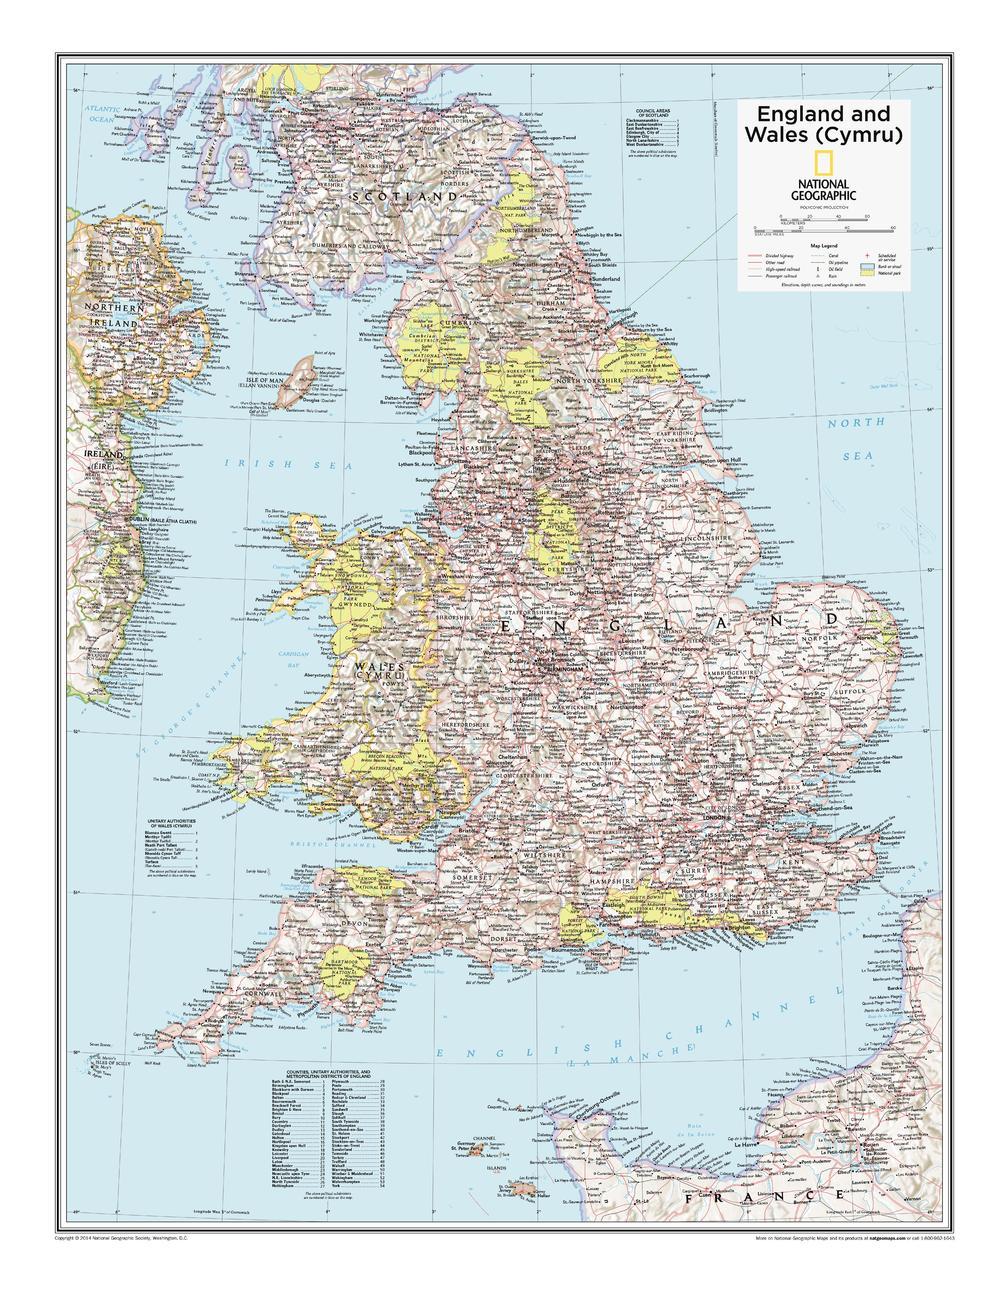 England and Wales (Cymru)